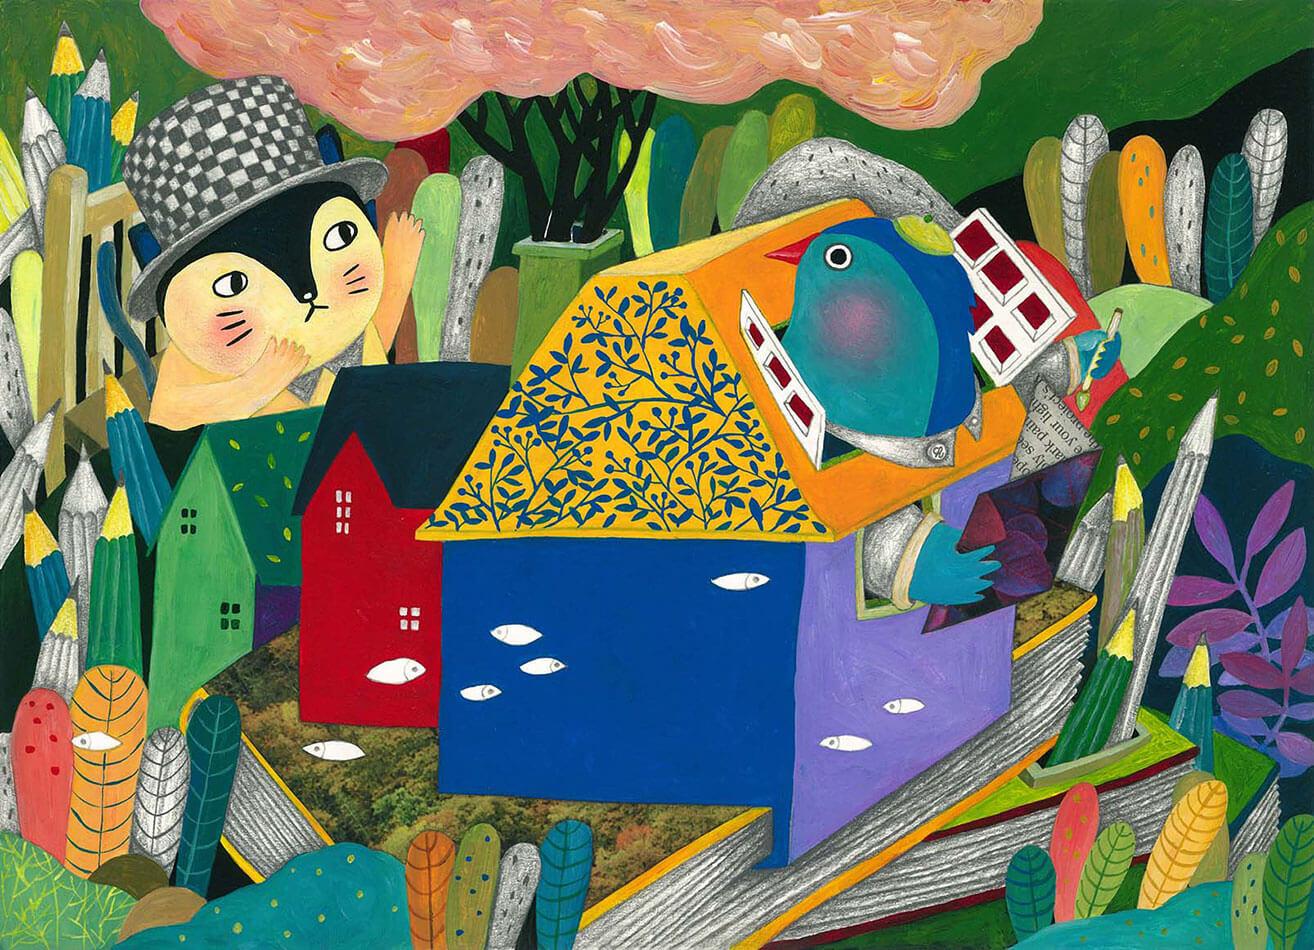 《Fantasy Storybook》,壓克力顏料及鉛筆等複合媒材,2016。科技業巨擘微軟公司所舉辦的Microsoft Surface創意平面大獎之銅獎作品。圖/陳姵含提供。